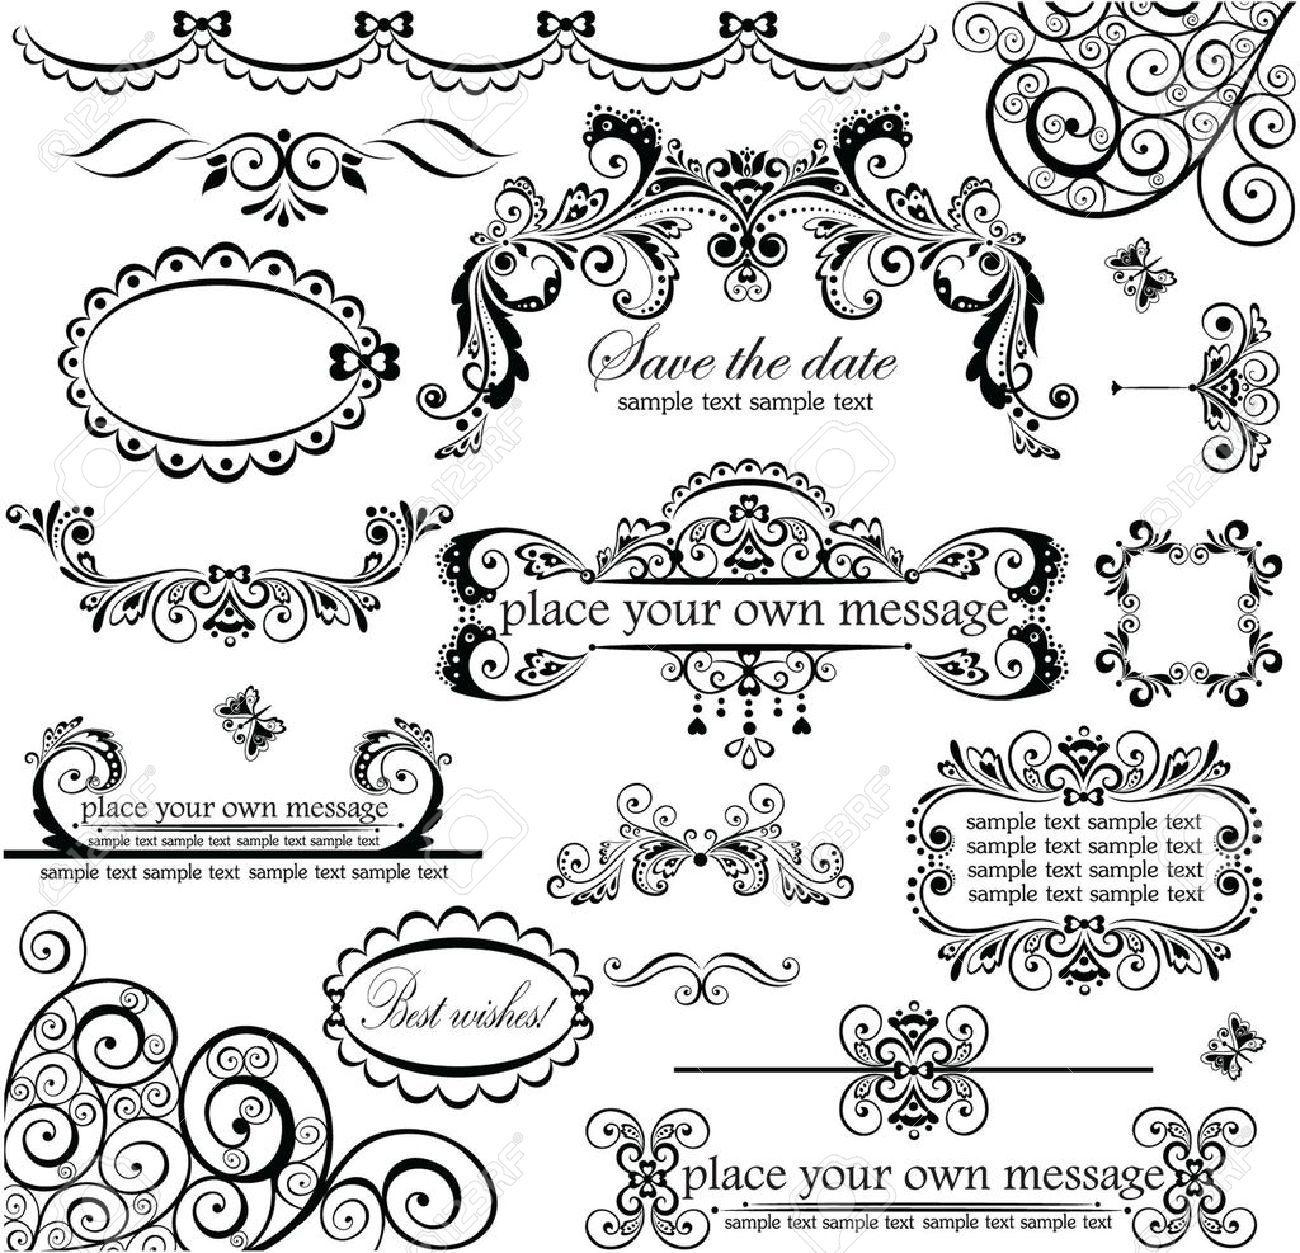 Images of elegant digital photo birthday invitations - Google Search ...